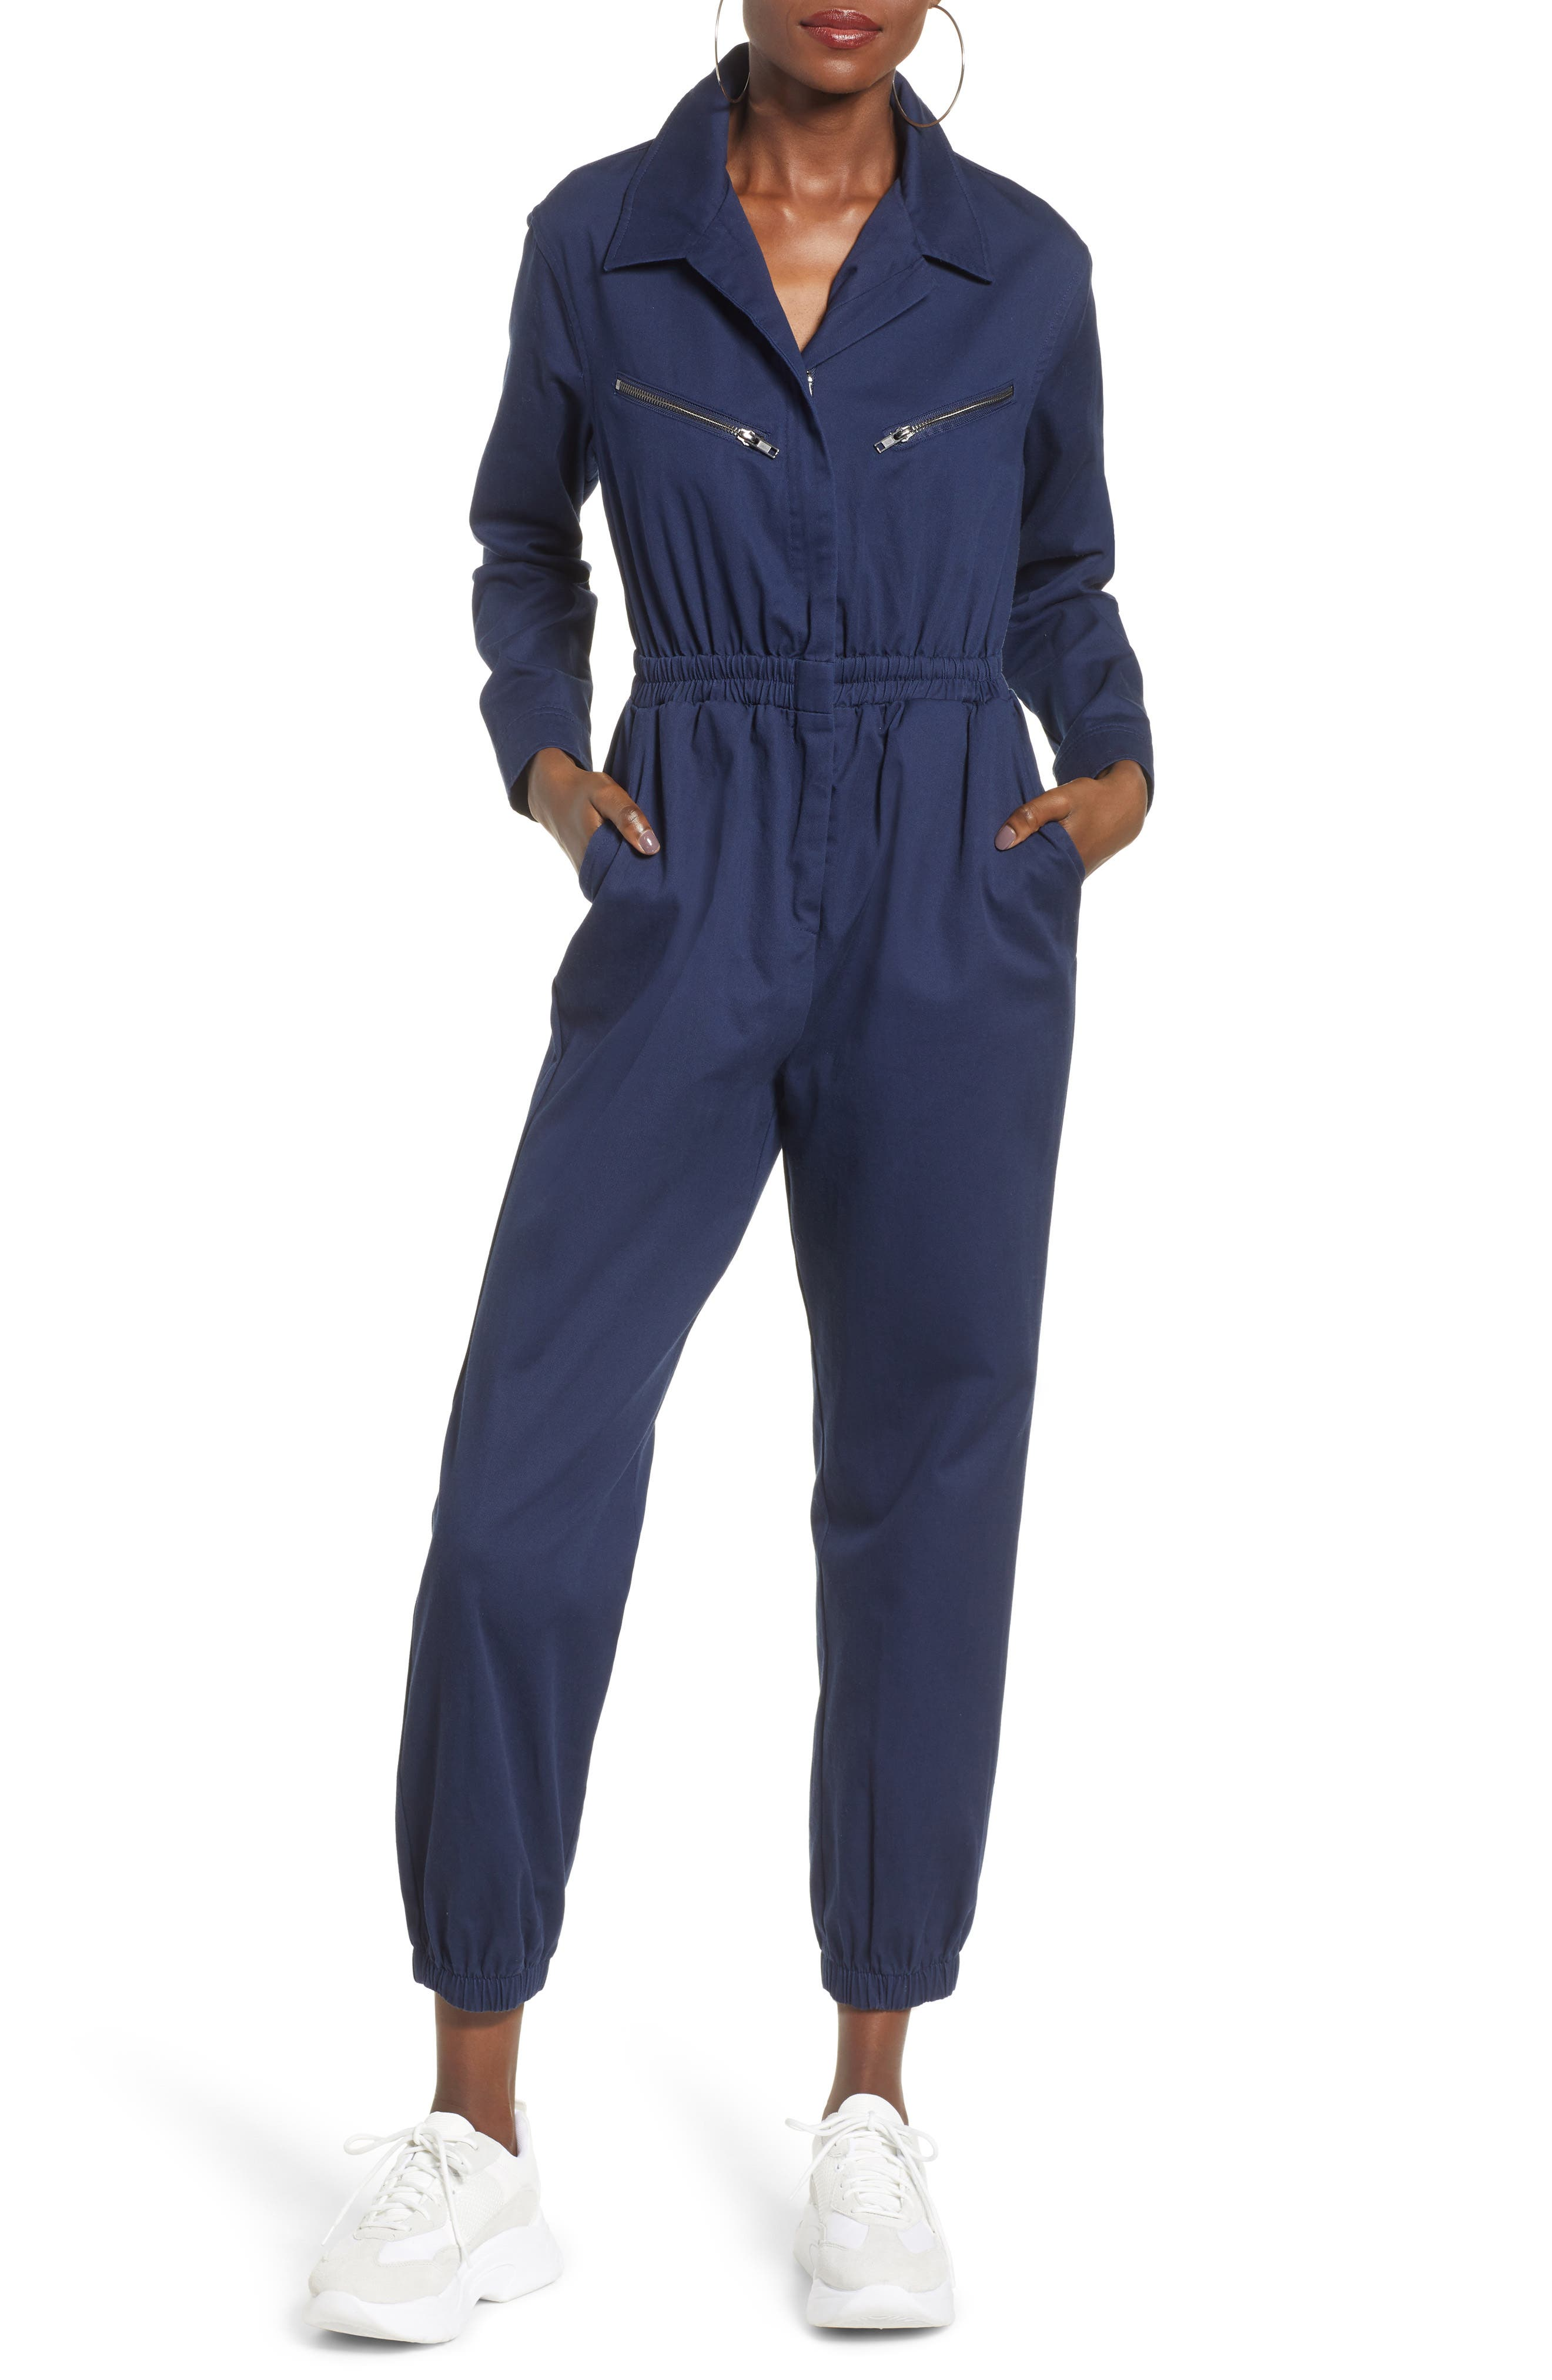 TEN SIXTY SHERMAN Twill Workwear Jumpsuit, Main, color, 400